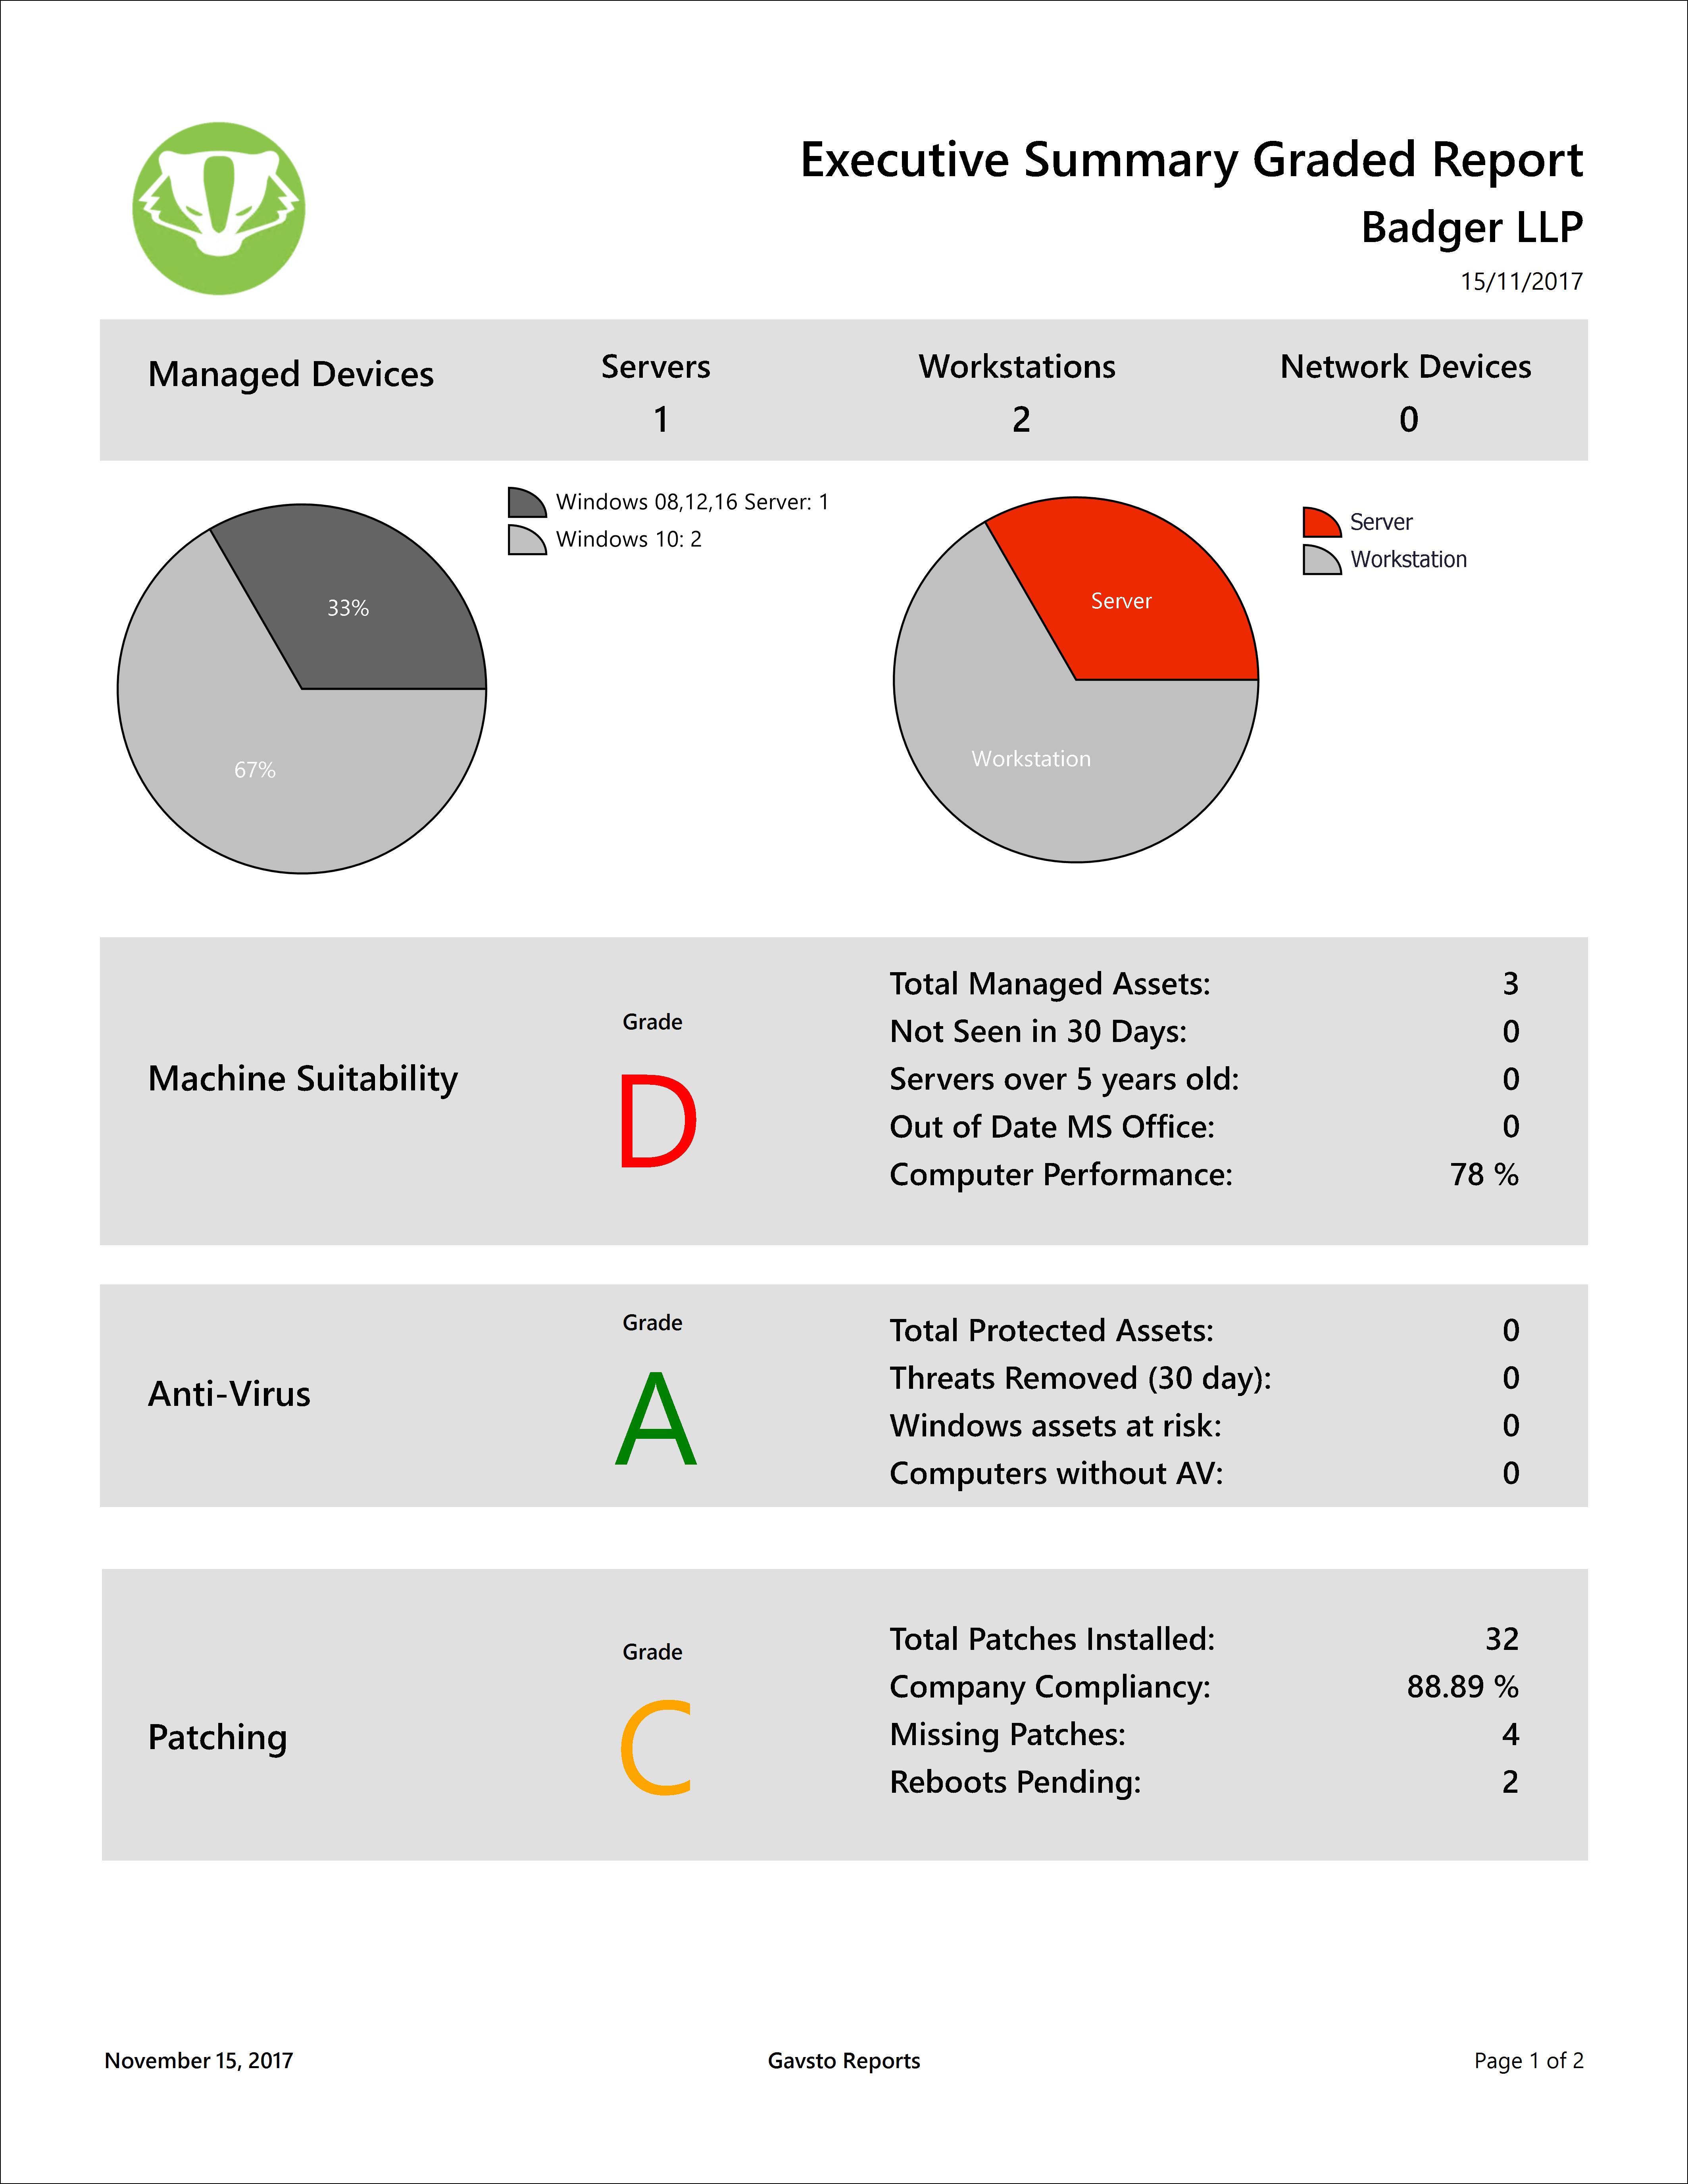 Premium LabTech Report Executive Summary Graded – Gavsto com